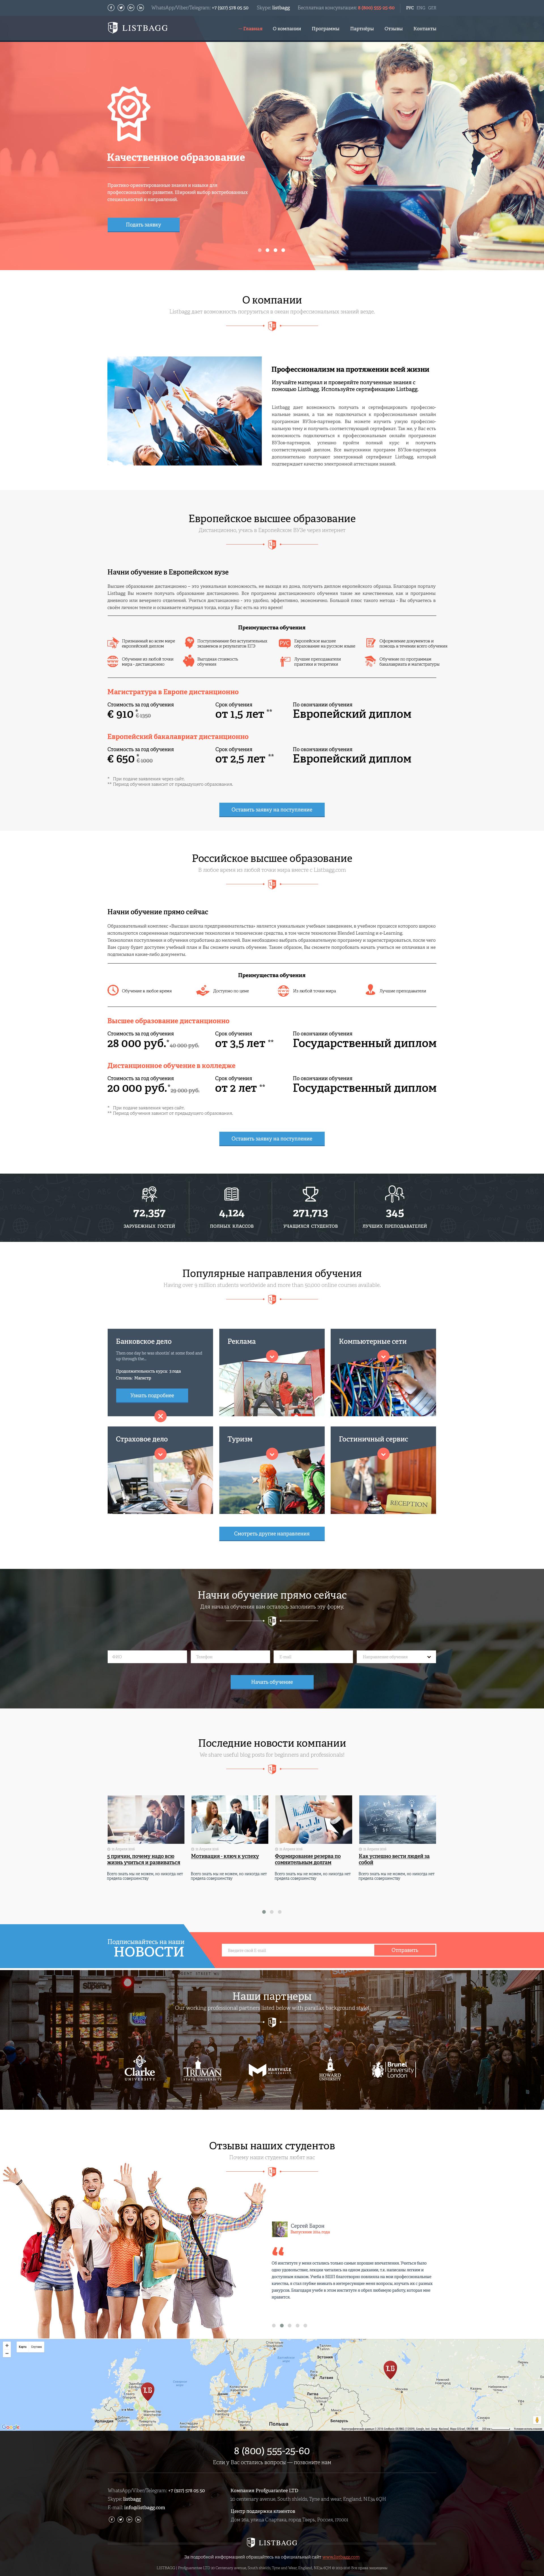 https://vladimir-alexandrov.com/wp-content/uploads/2017/10/site_Listbagg_1.jpg